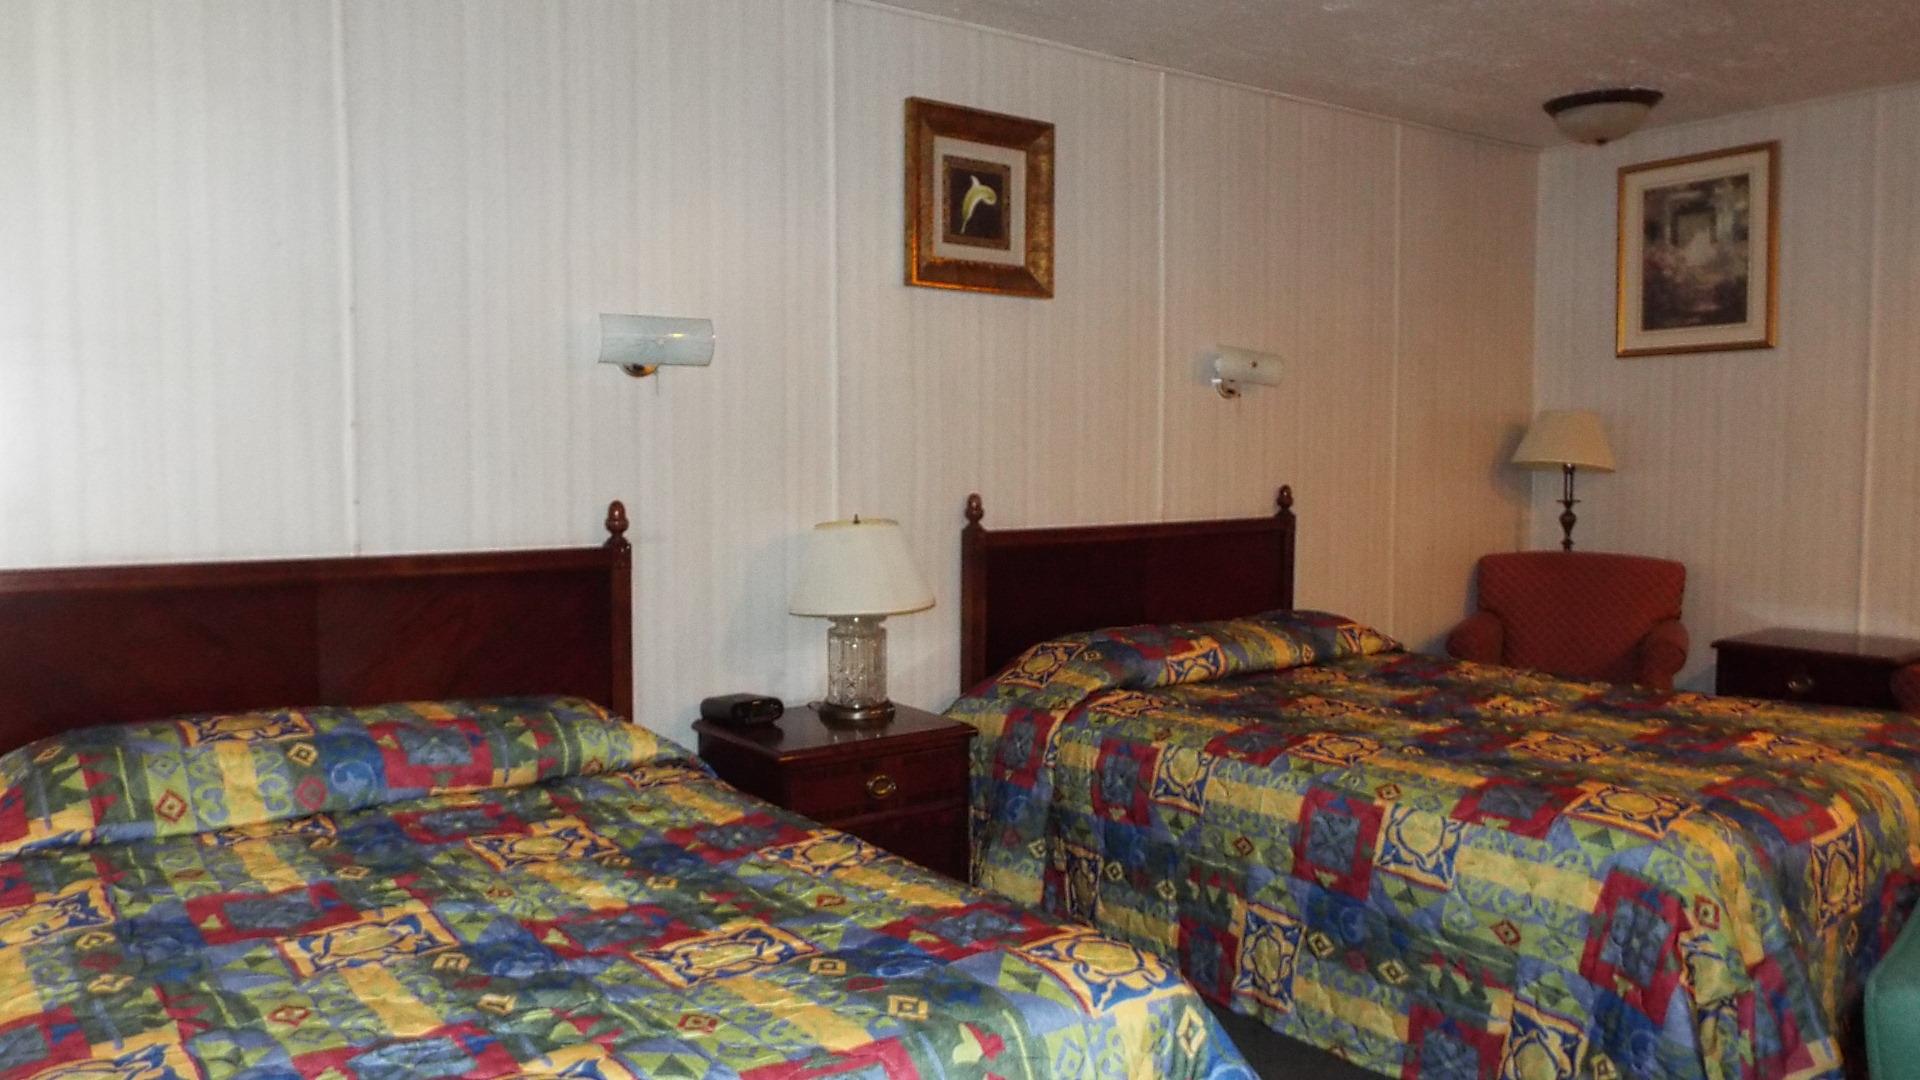 Modern Motel, Vinton IA